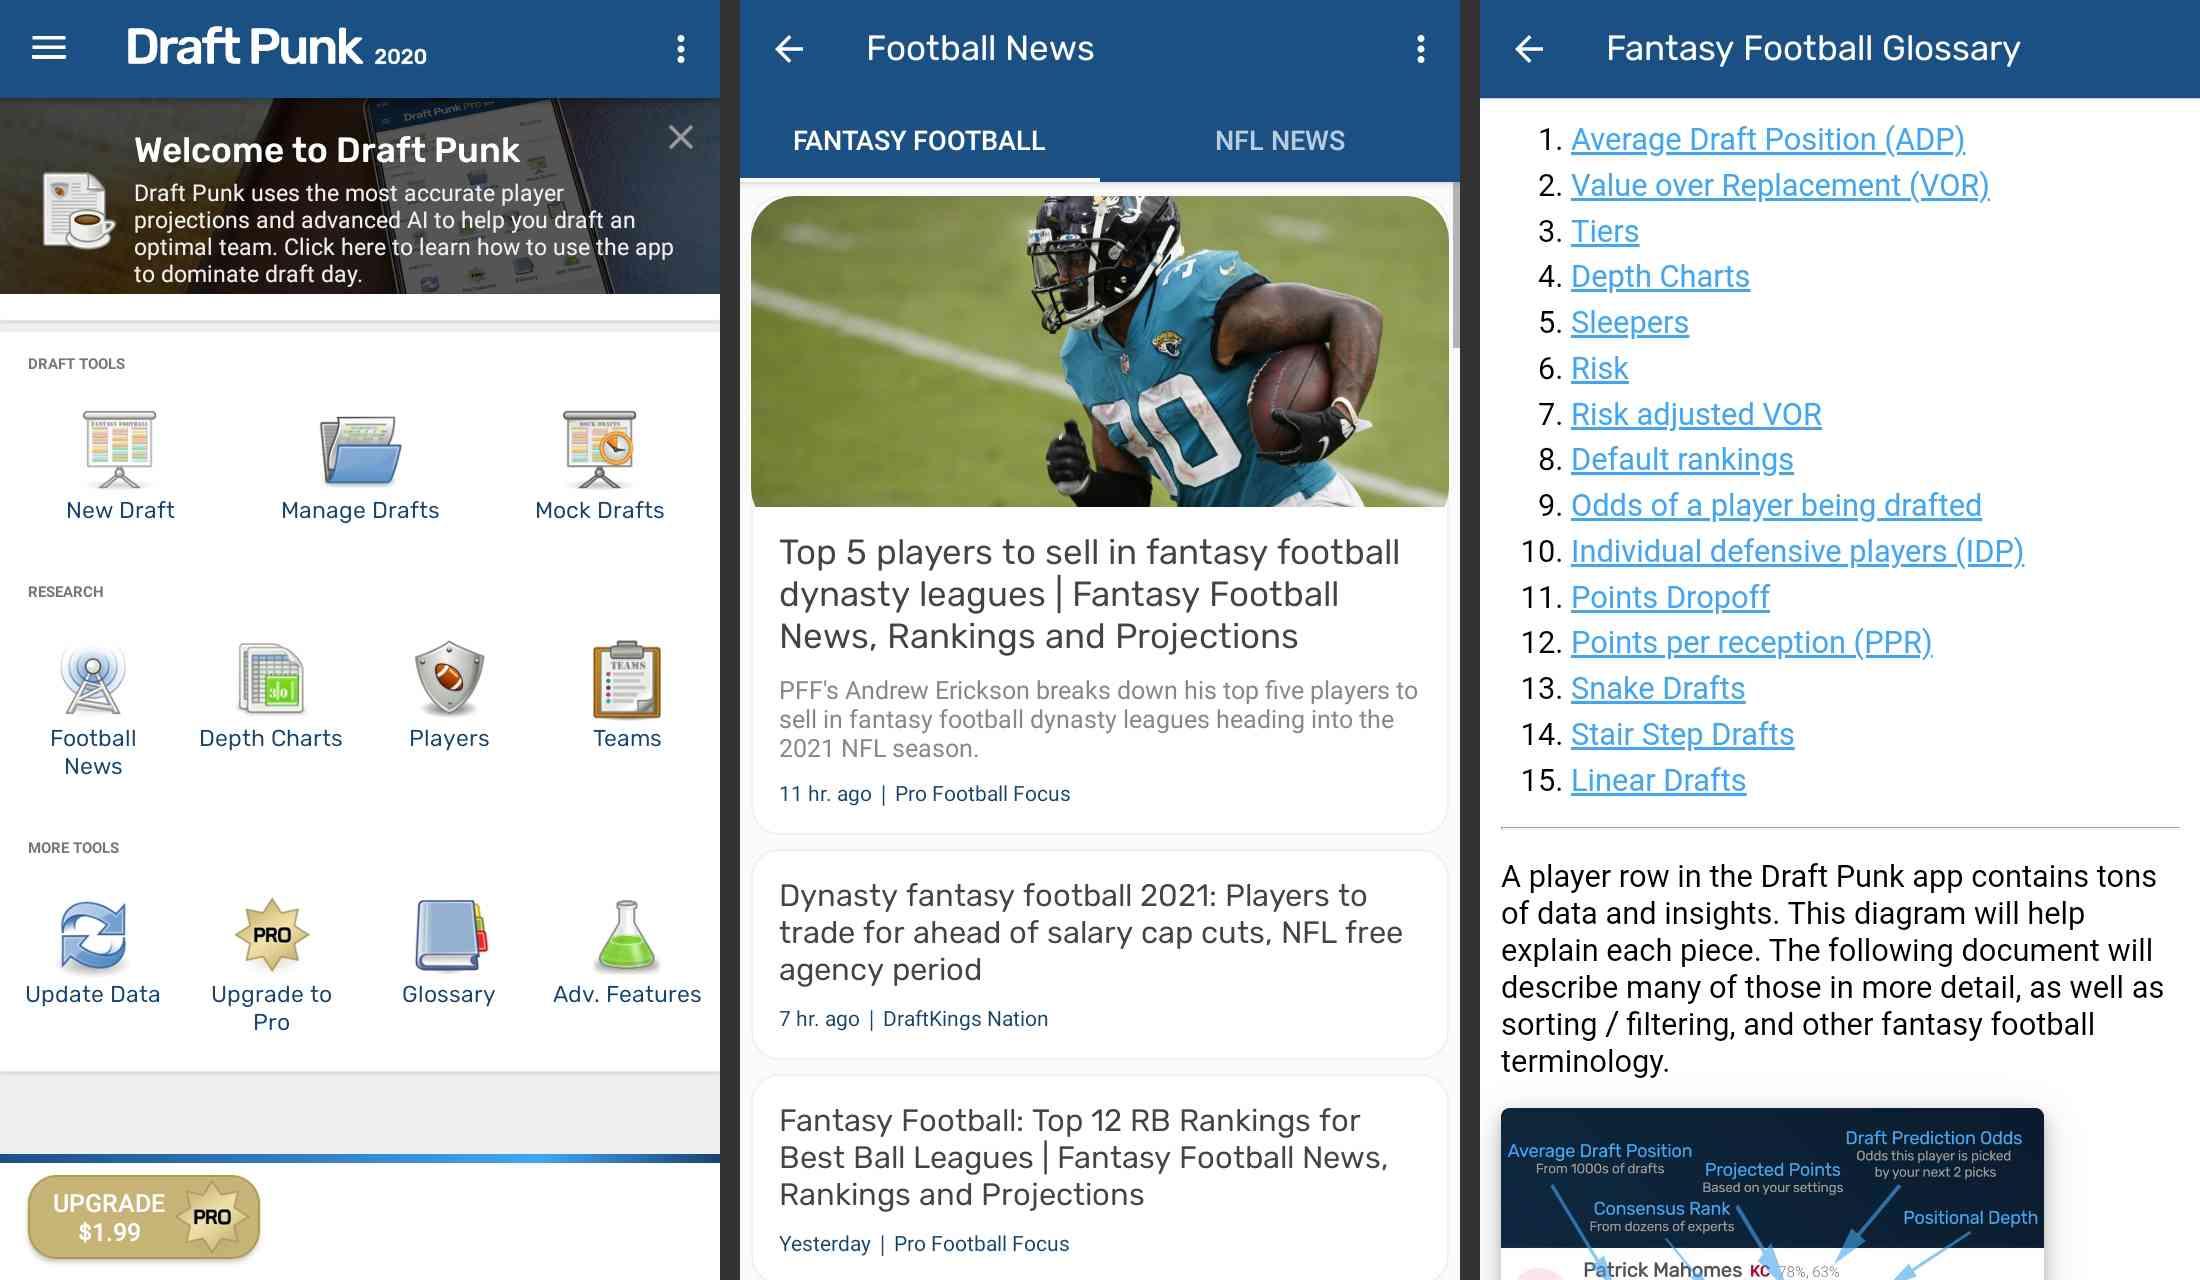 Draft Punk fantasy football app for Android